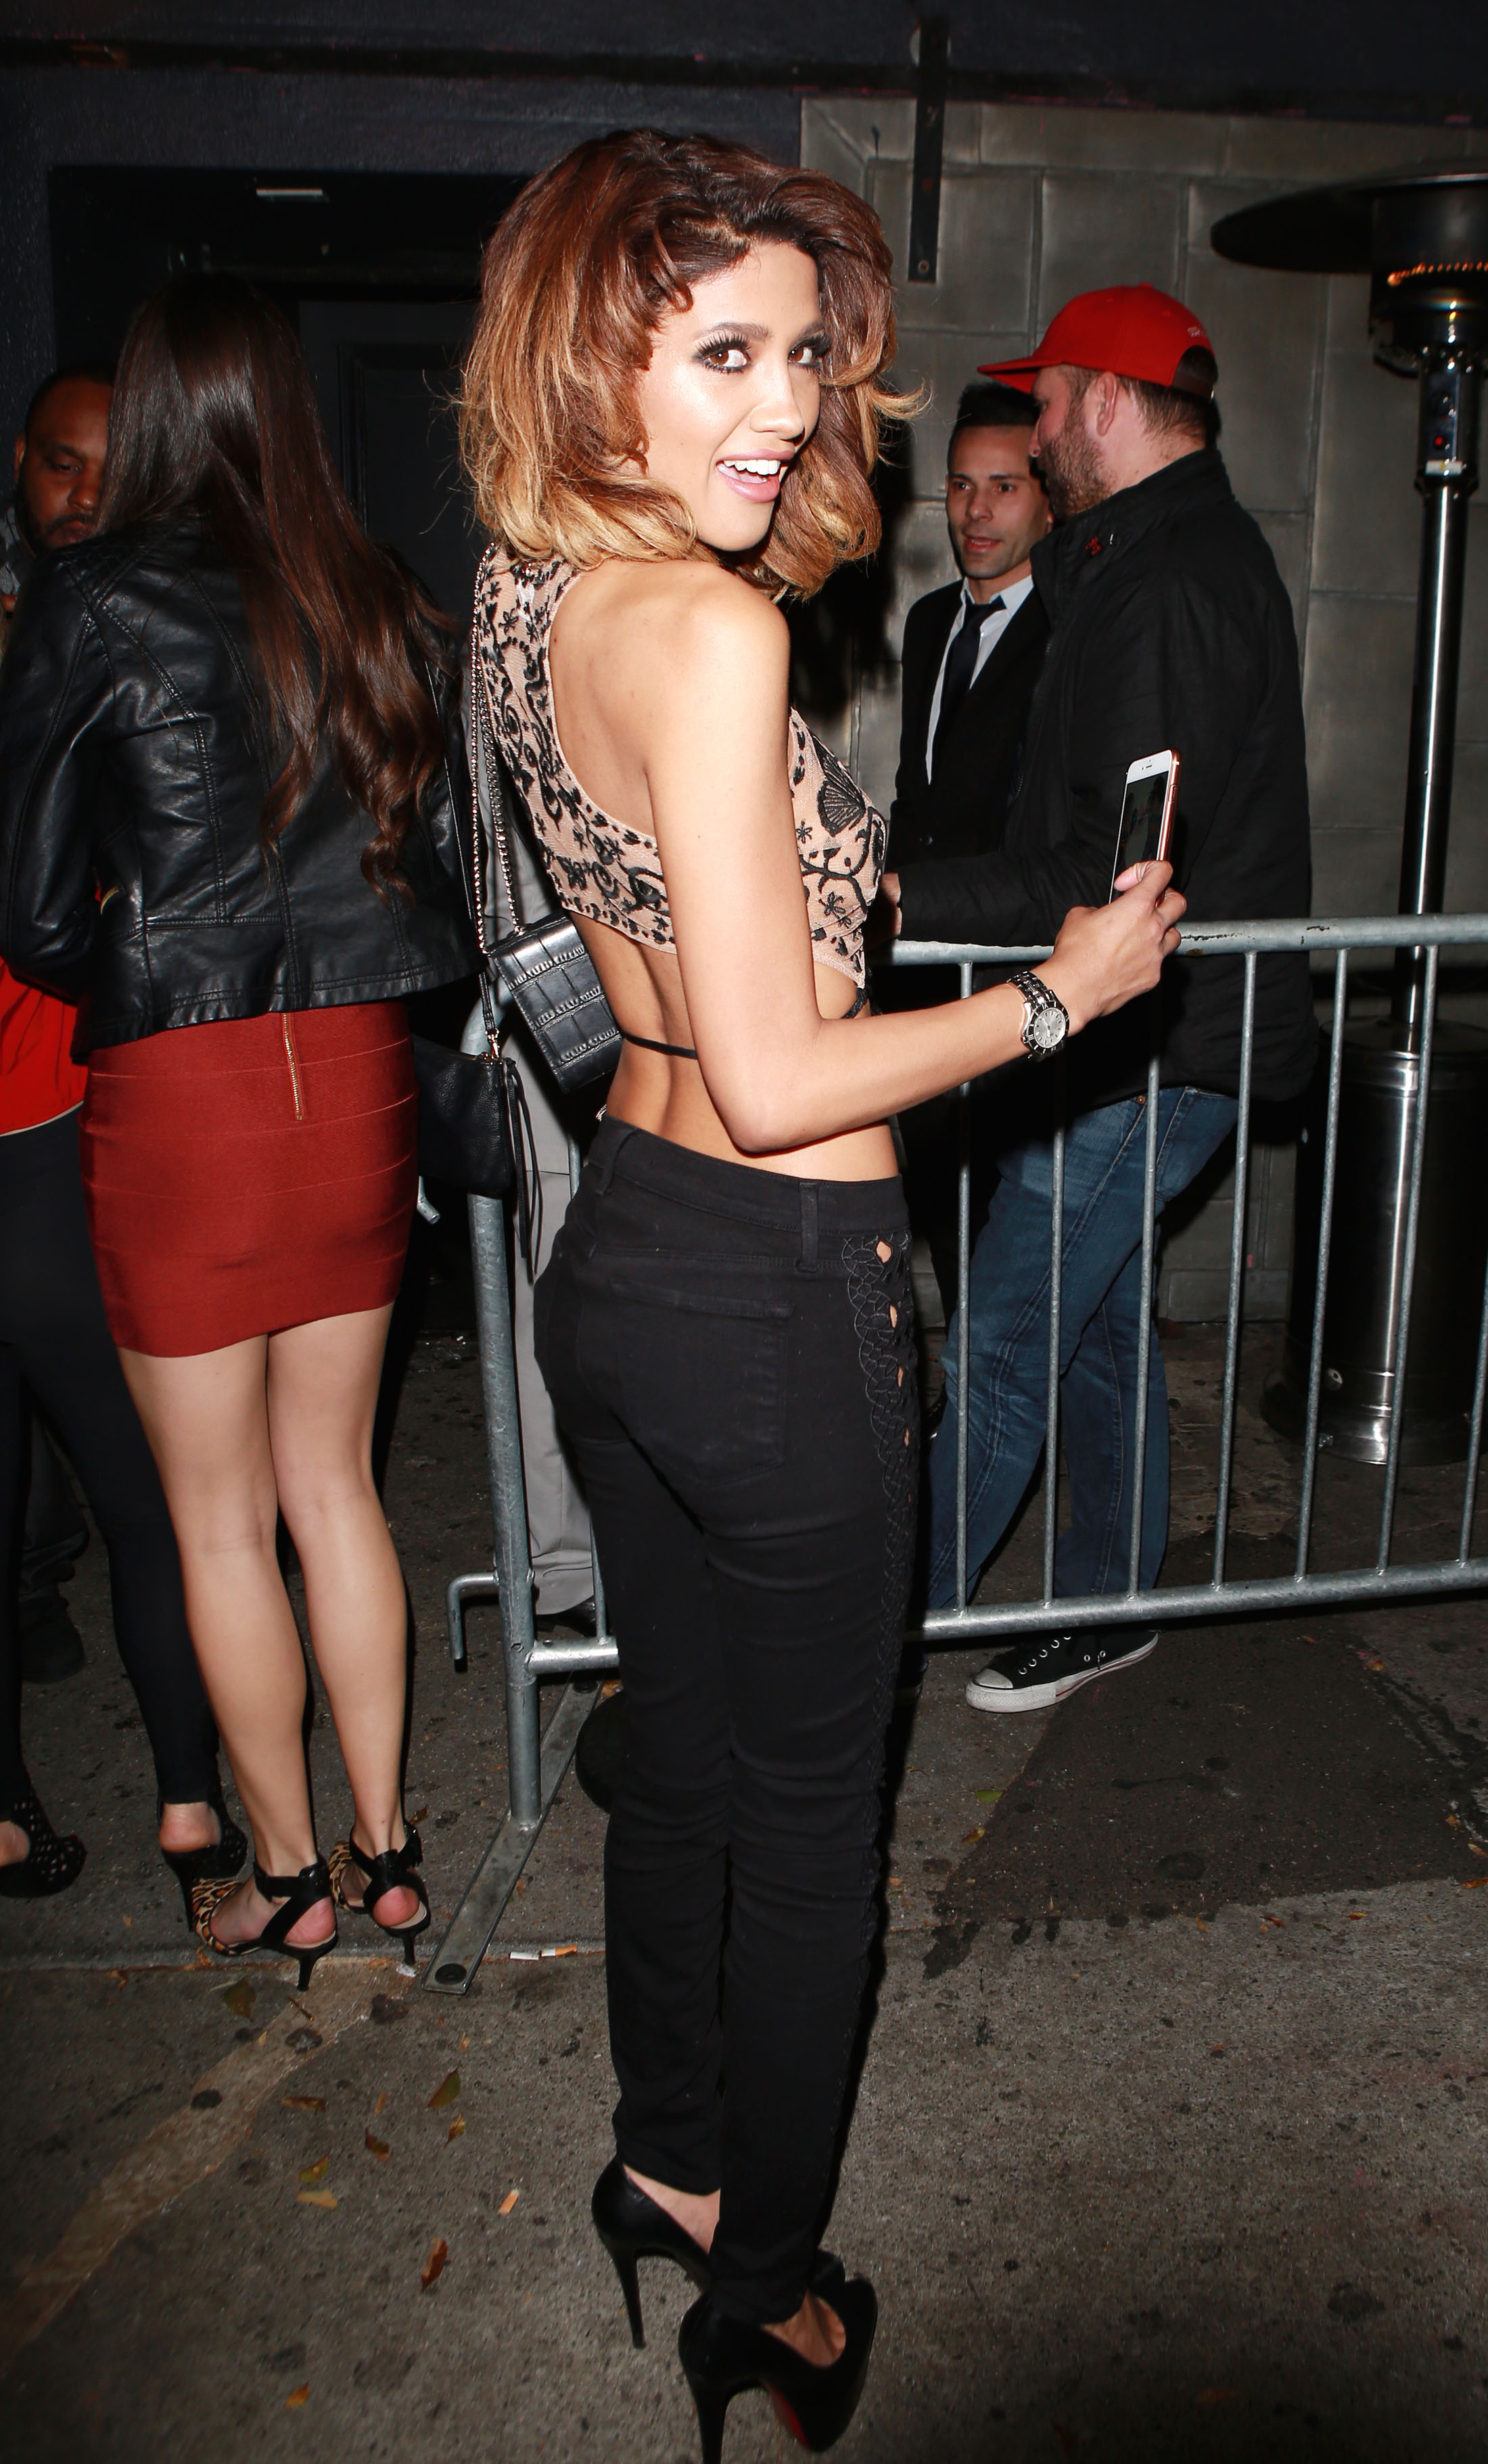 Lisa-Bise-Cj-Franco-Braless-See-Through-10  Celebrity-Slipscom-3979